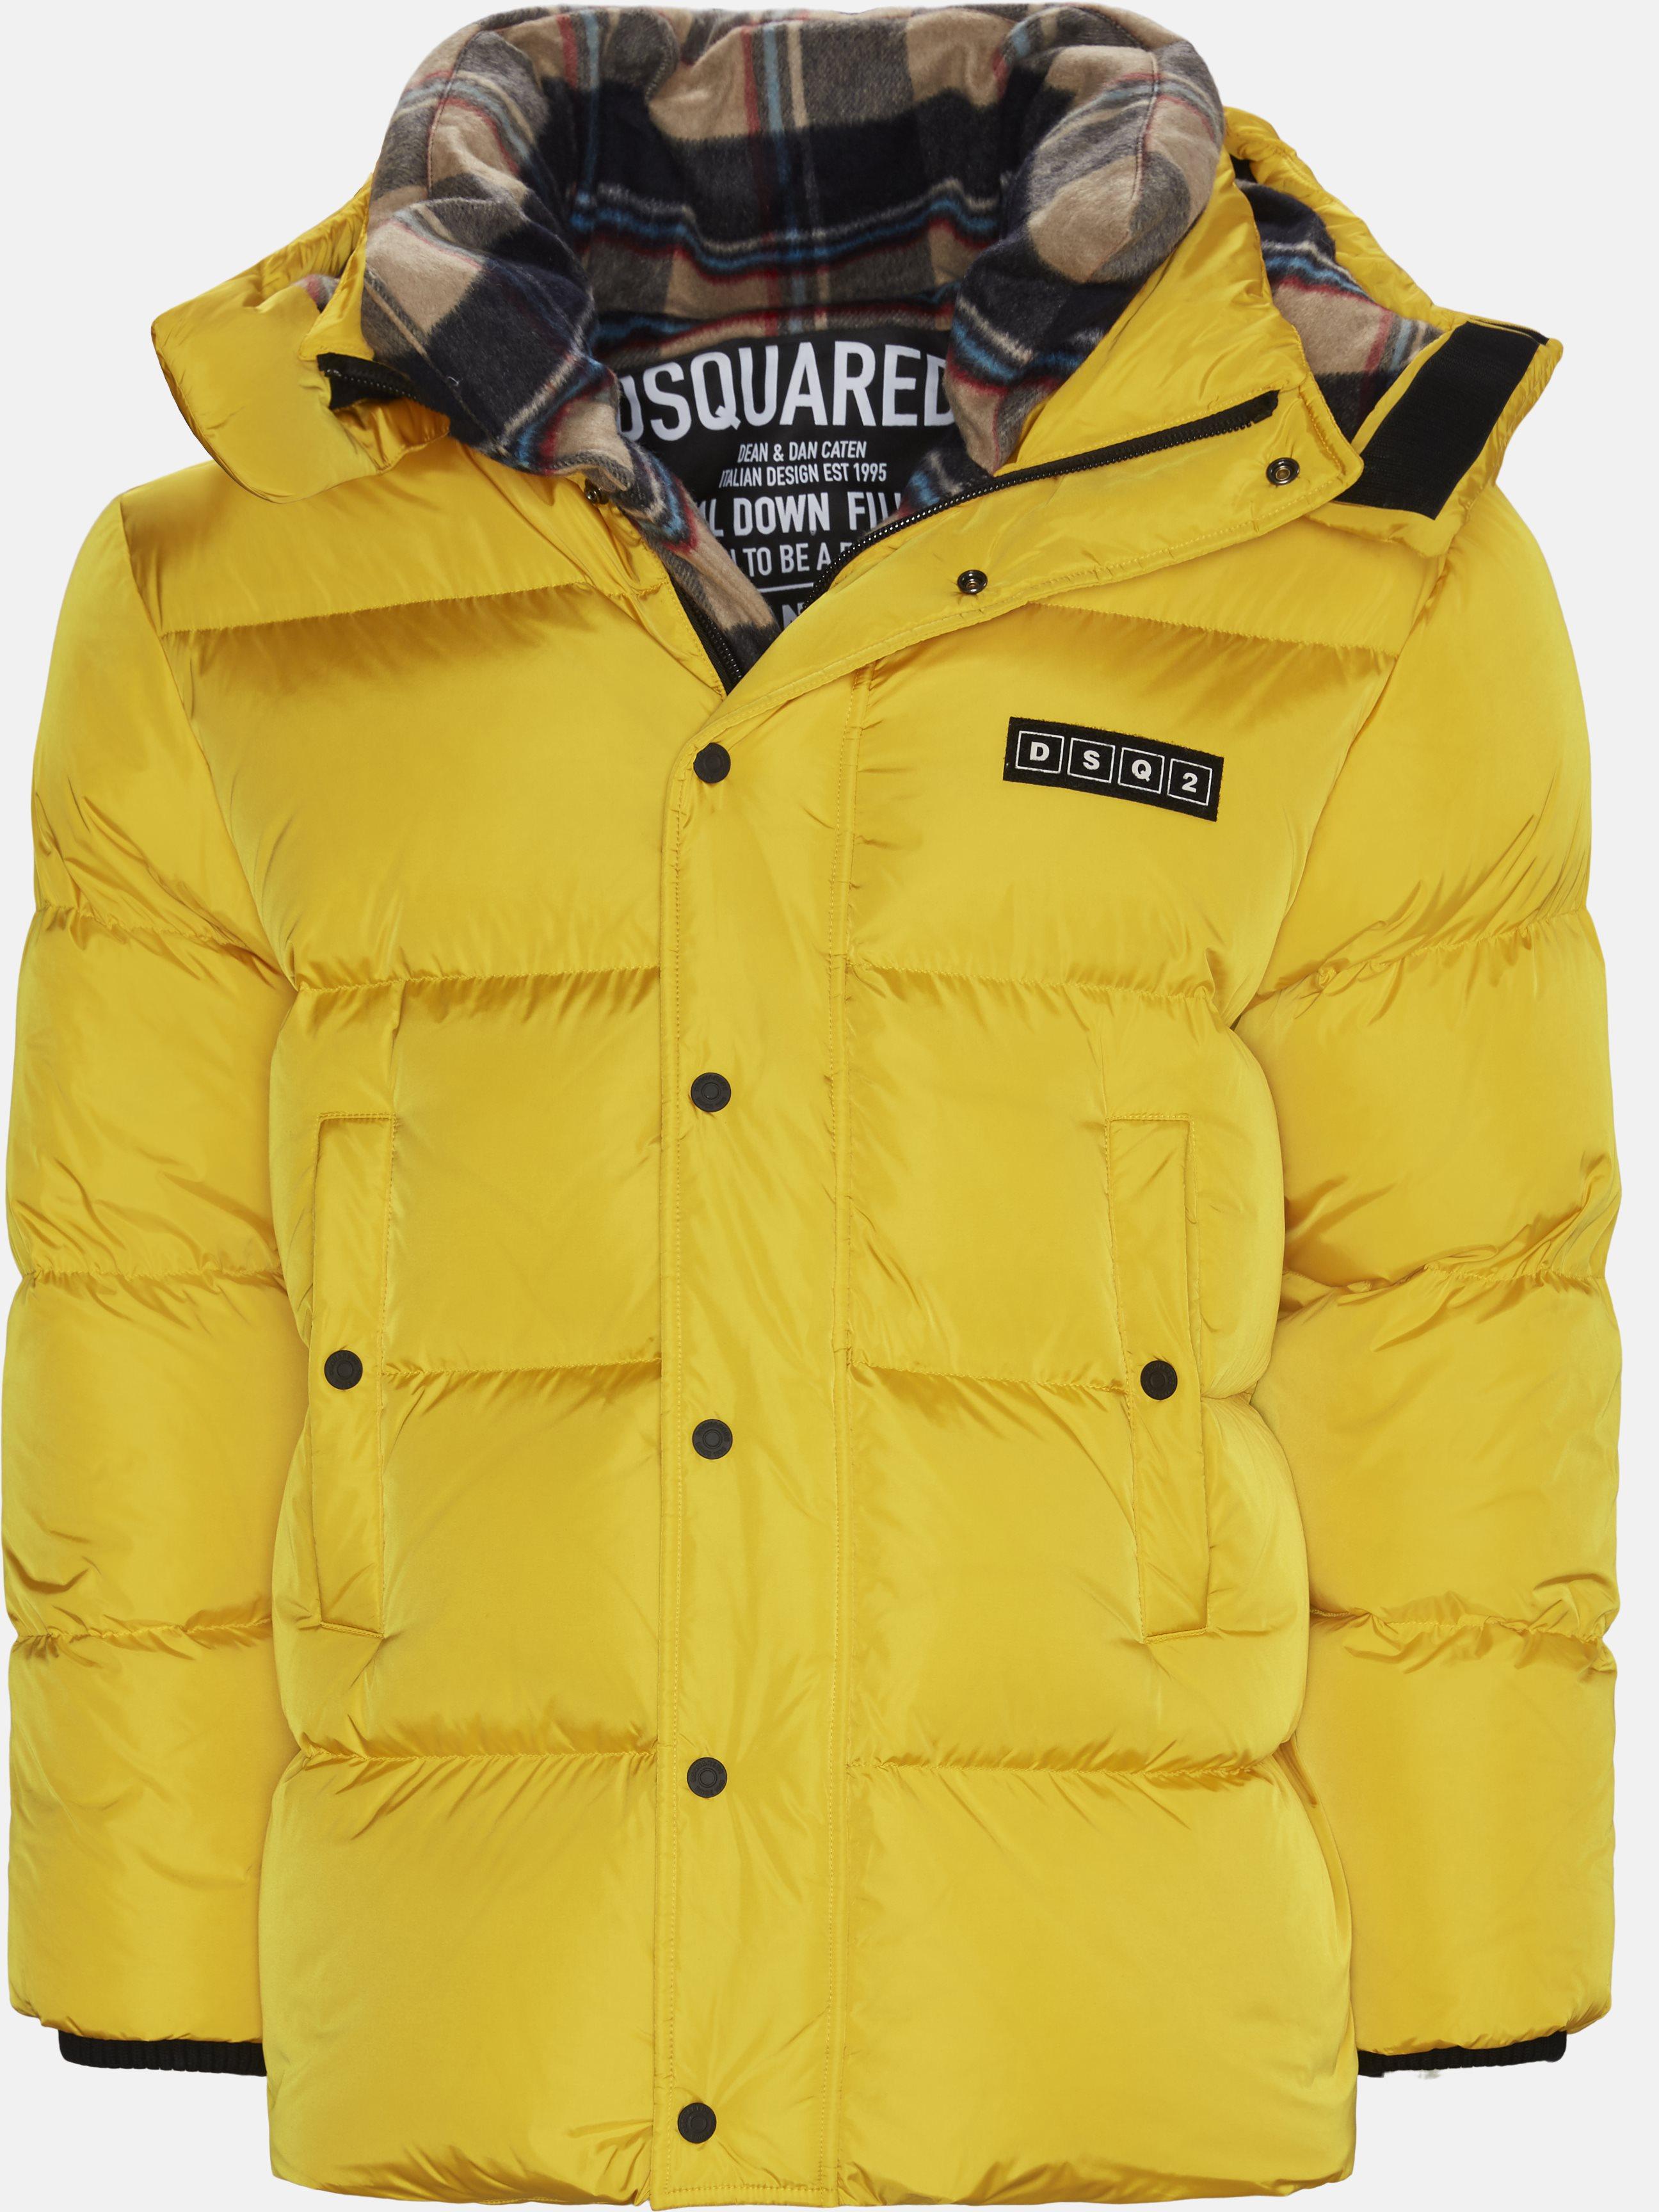 Jackets - Oversized - Yellow